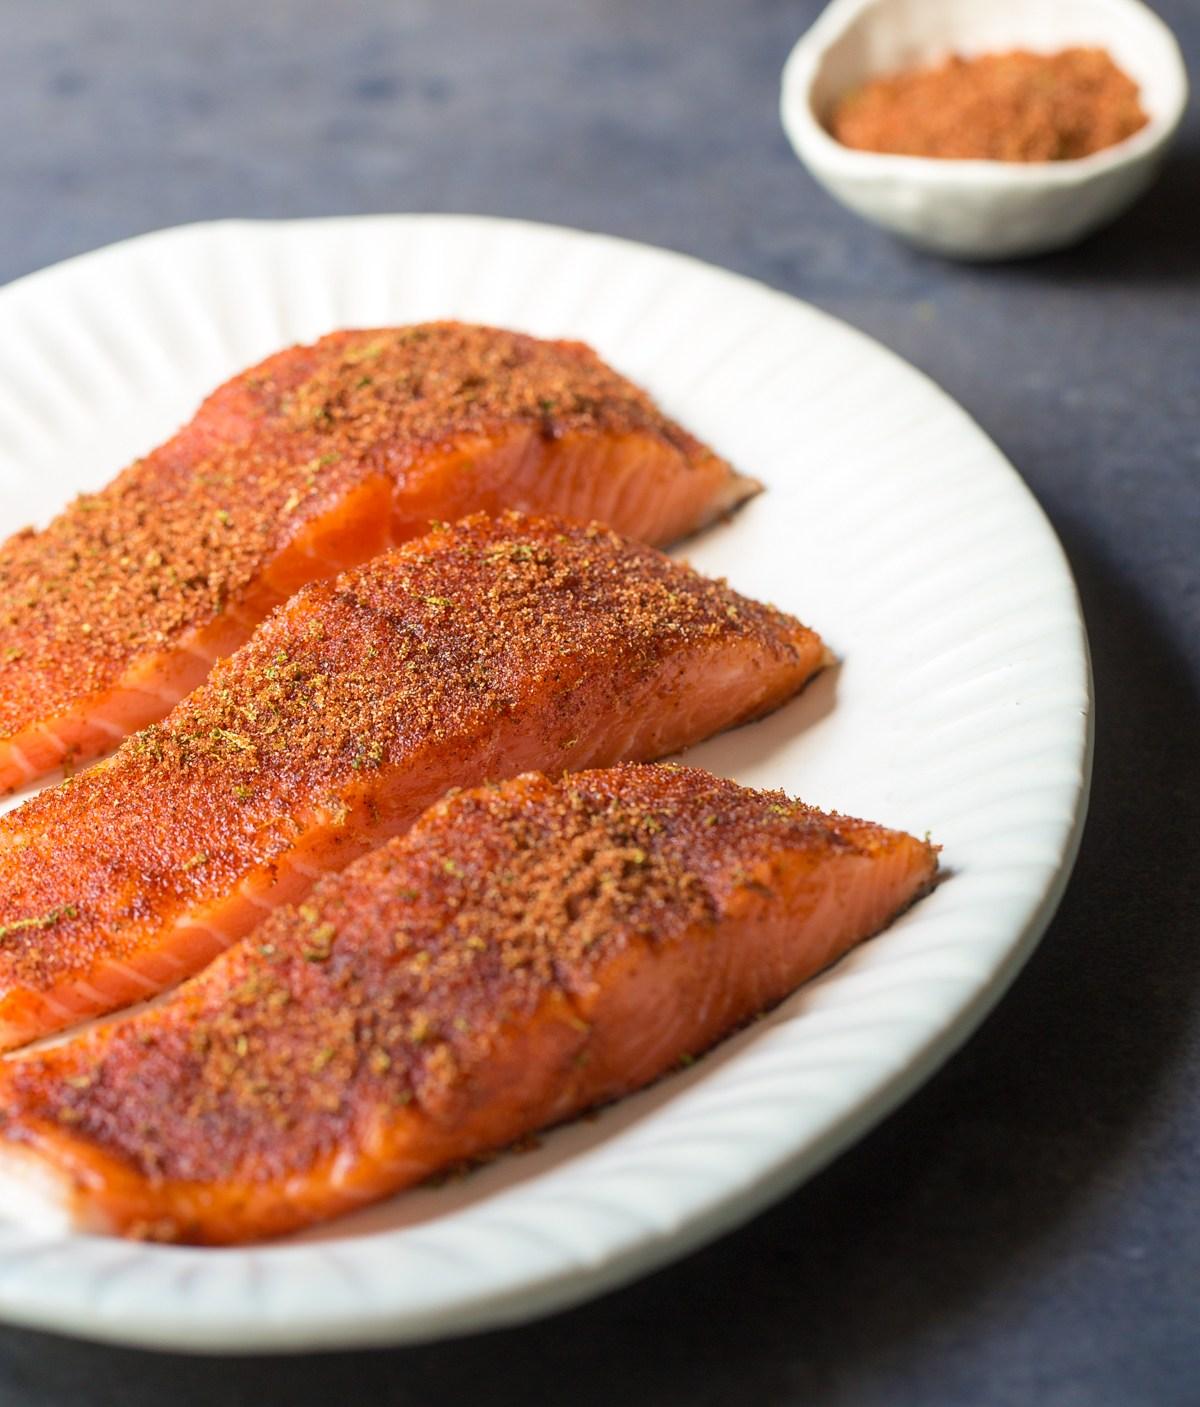 Seasoned Salmon on a Plate